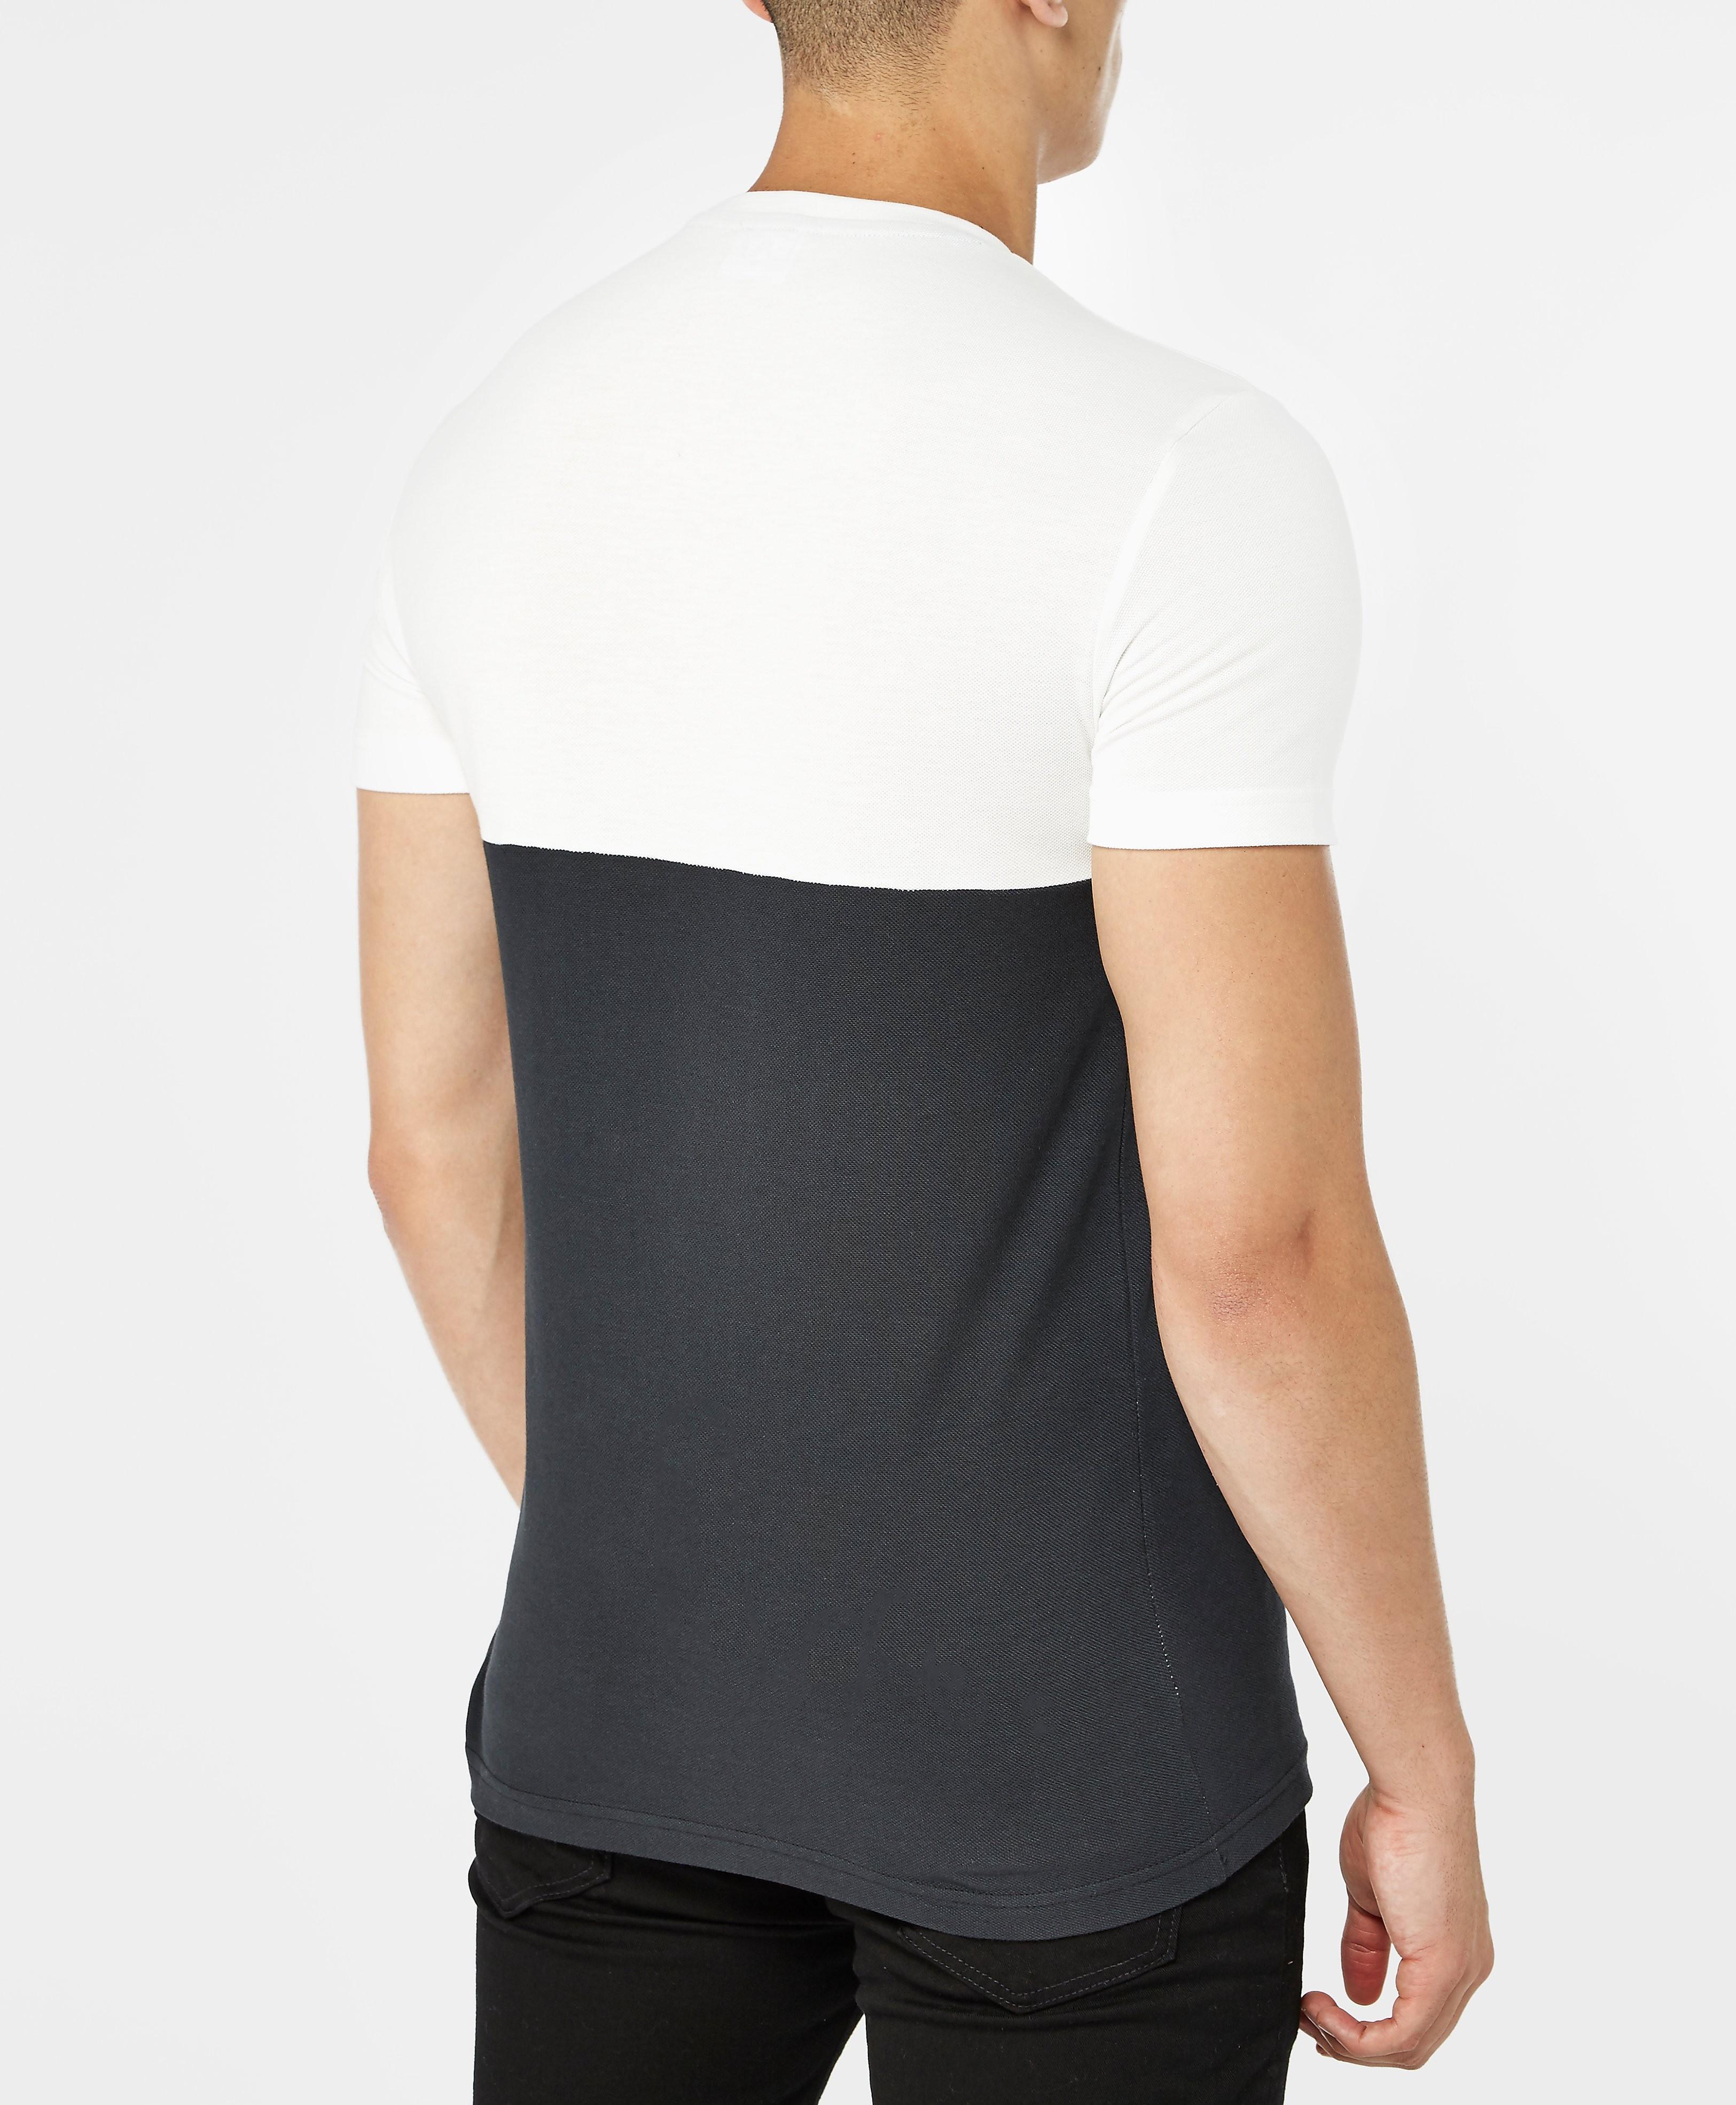 Emporio Armani EA7 Evo T-Shirt